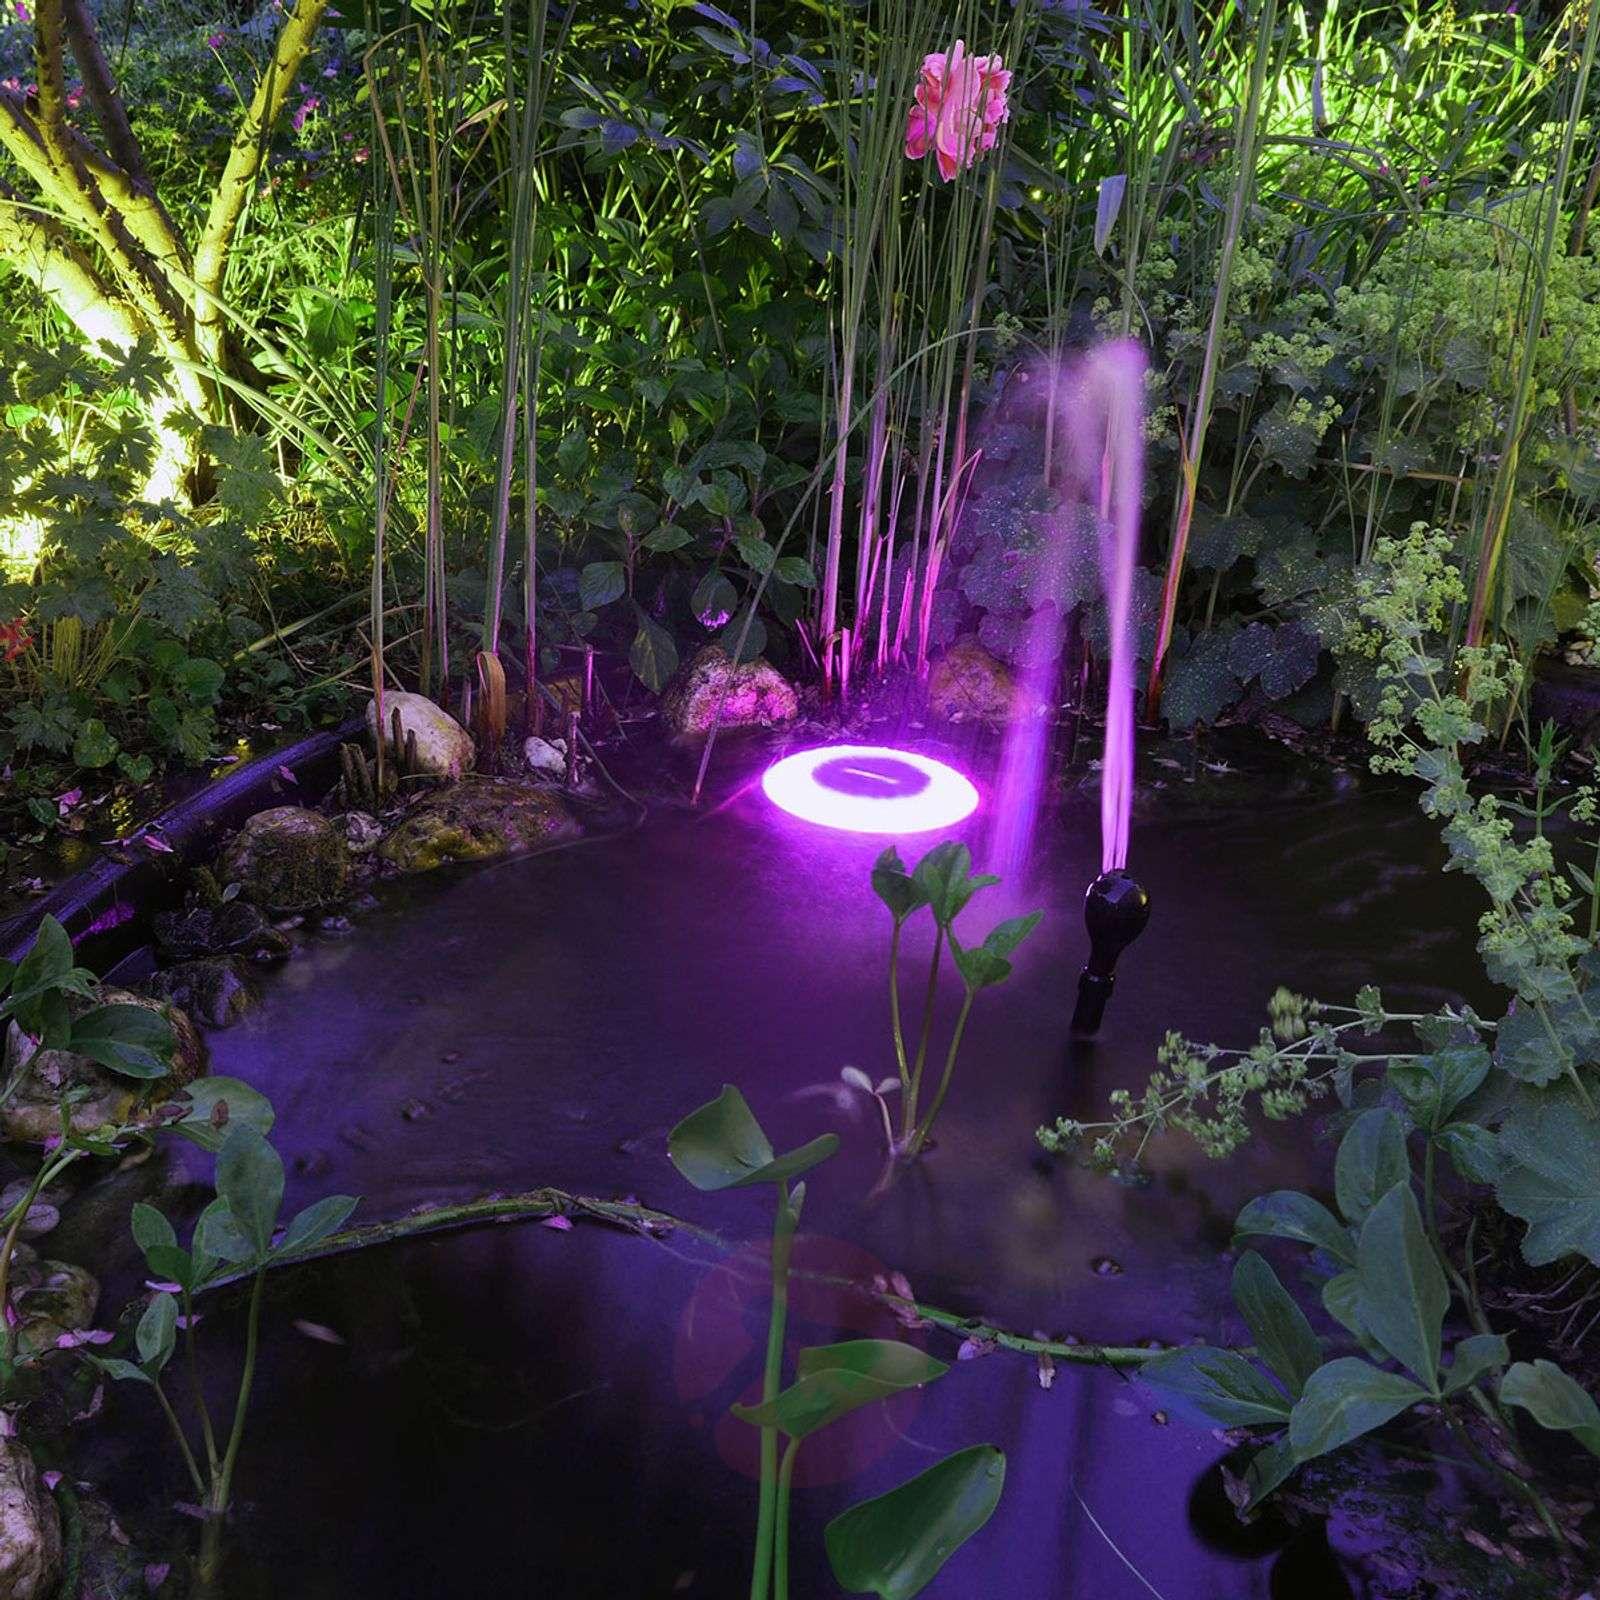 MiPow Playbulb solar LED decorative light set of 3-5543020-06